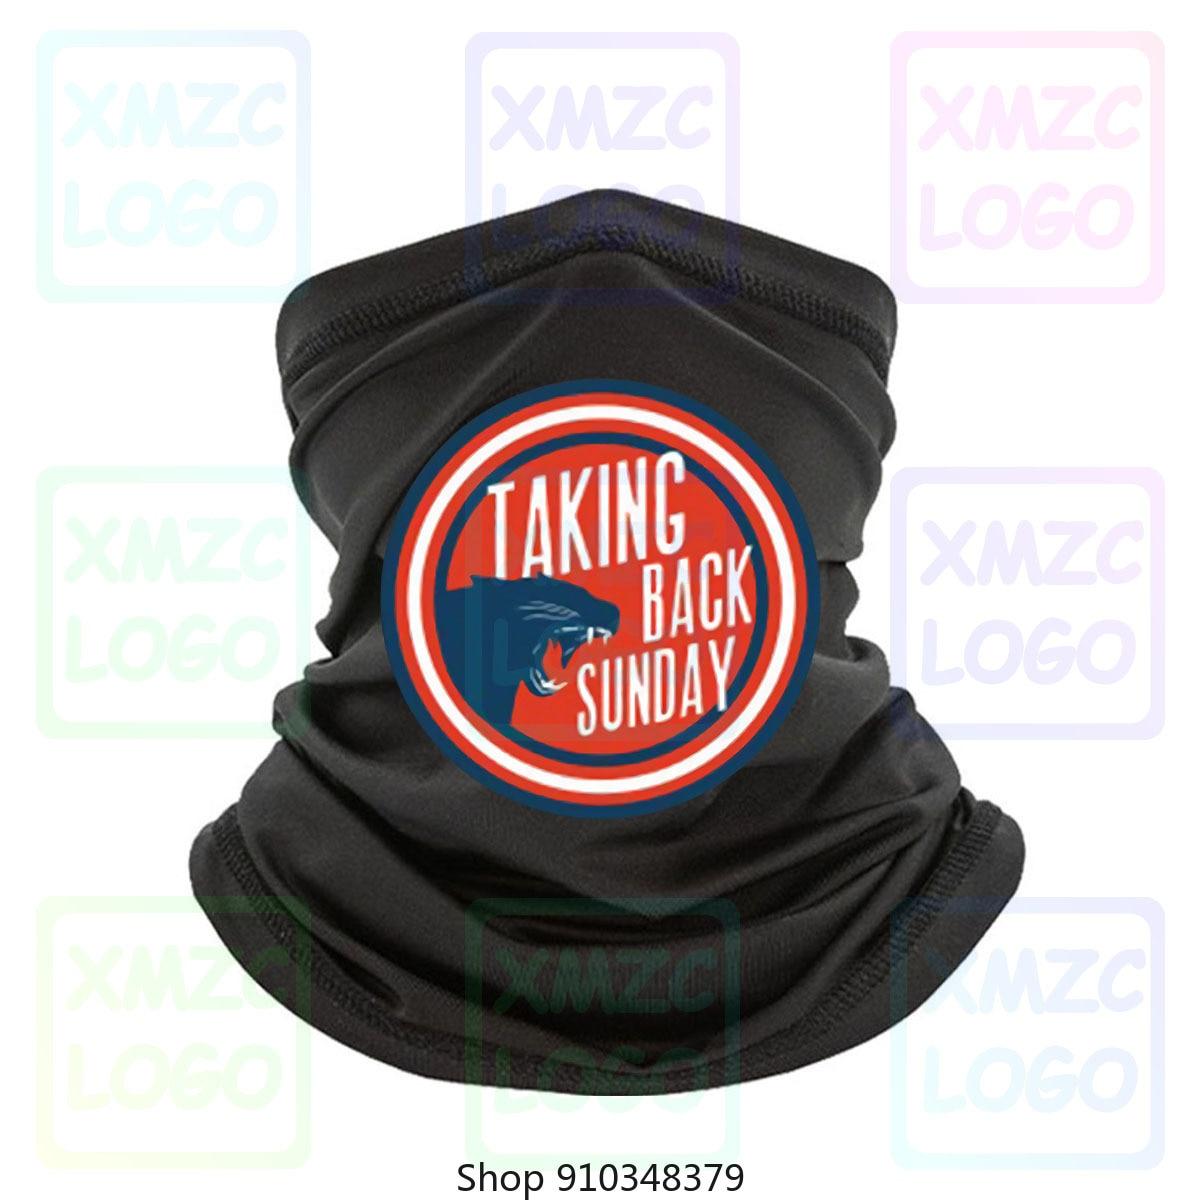 Retro cbc logotipo g200 bandana ultra algodão bandana bandana bandana lenço pescoço mais quente feminino